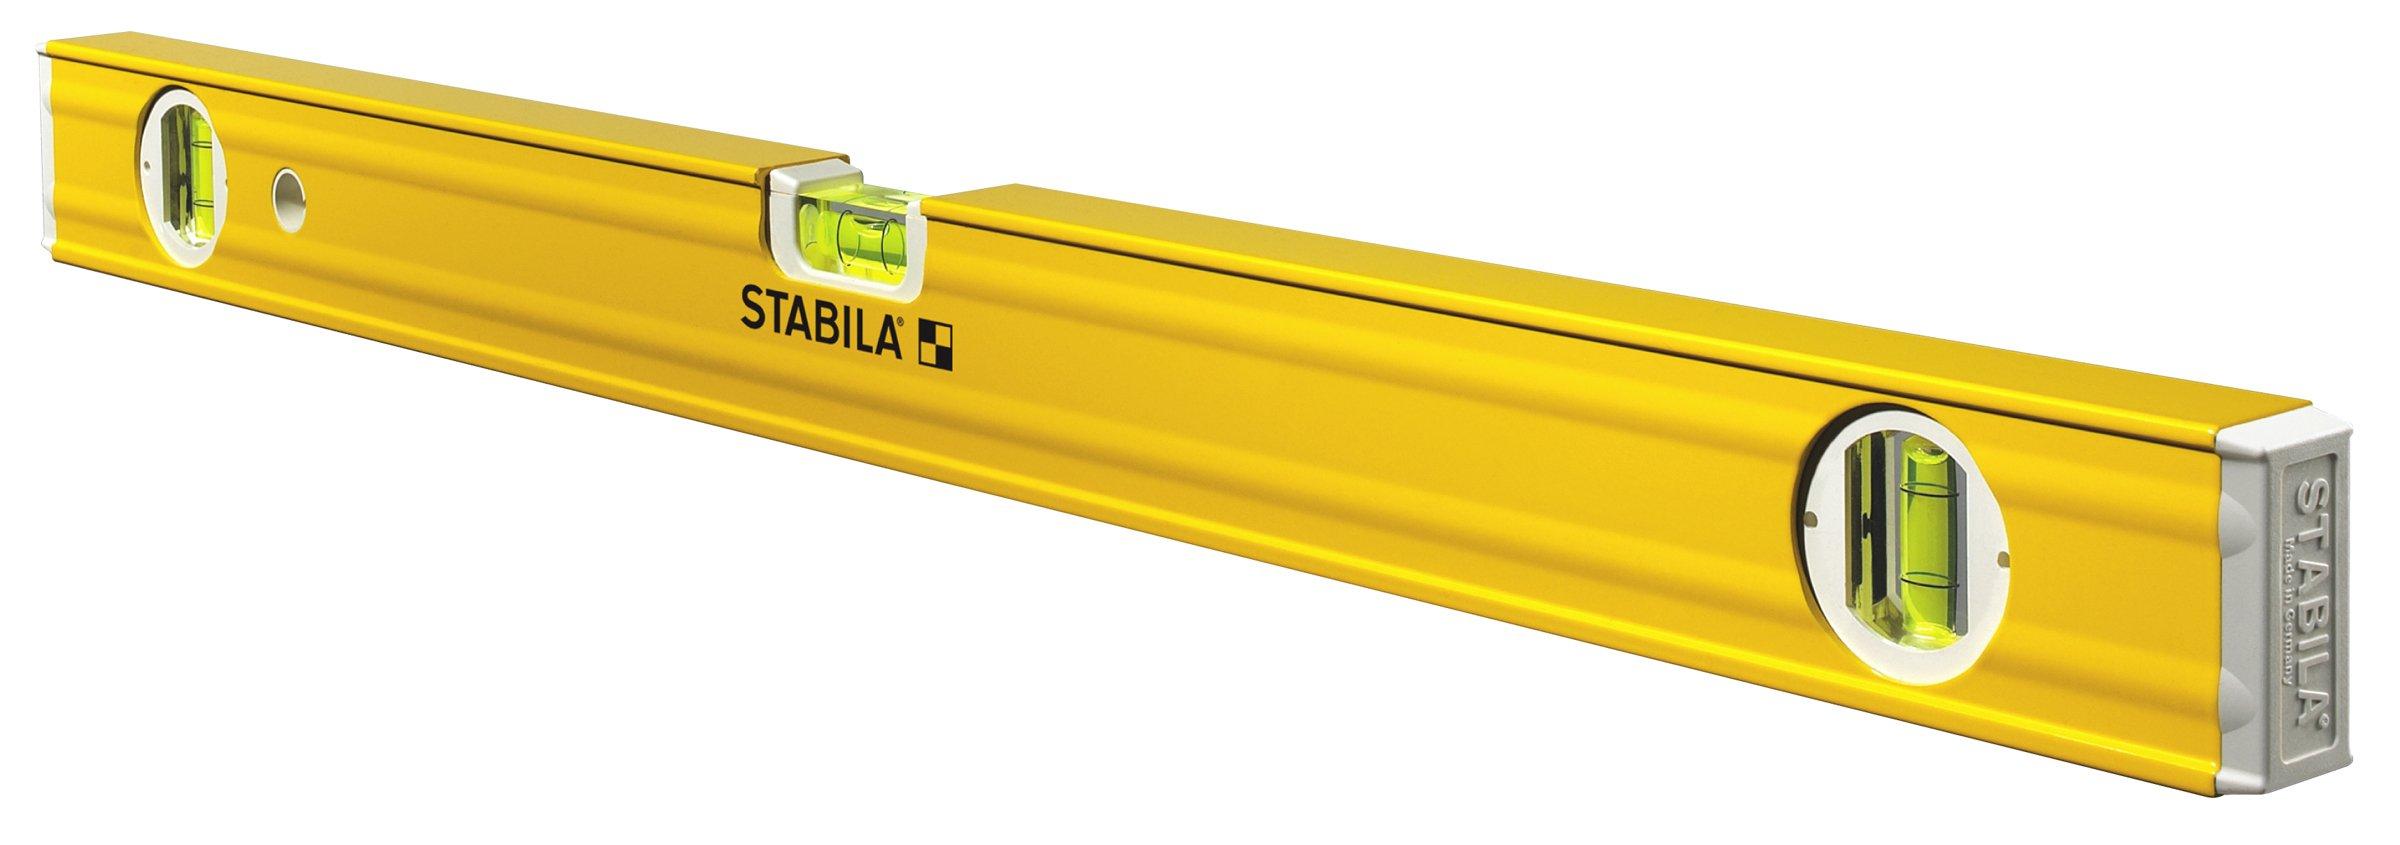 Stabila 29024 Type 80A-2 24'' Level